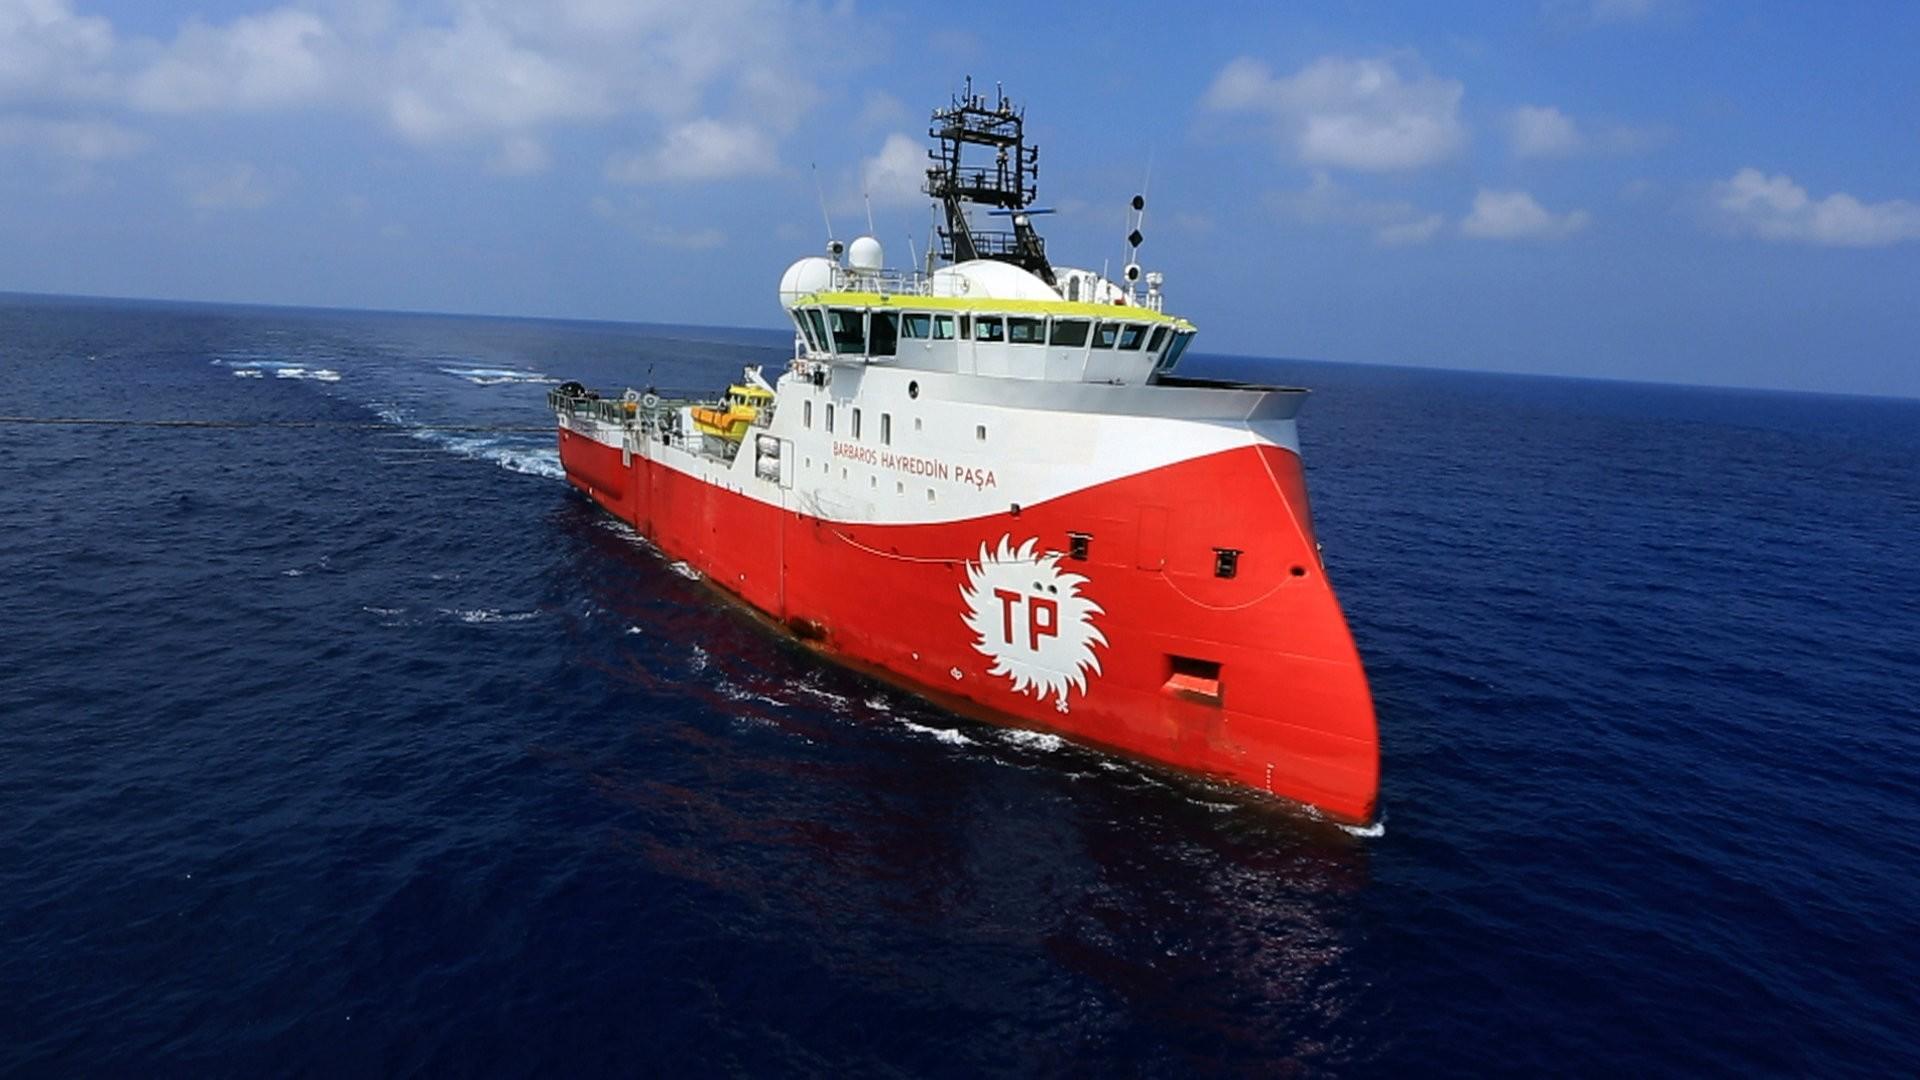 Turkeyu2019s first seismic vessel, the Barbaros Hayreddin Pau015fa has been conducting exploration operations in the Mediterranean since April 2017.